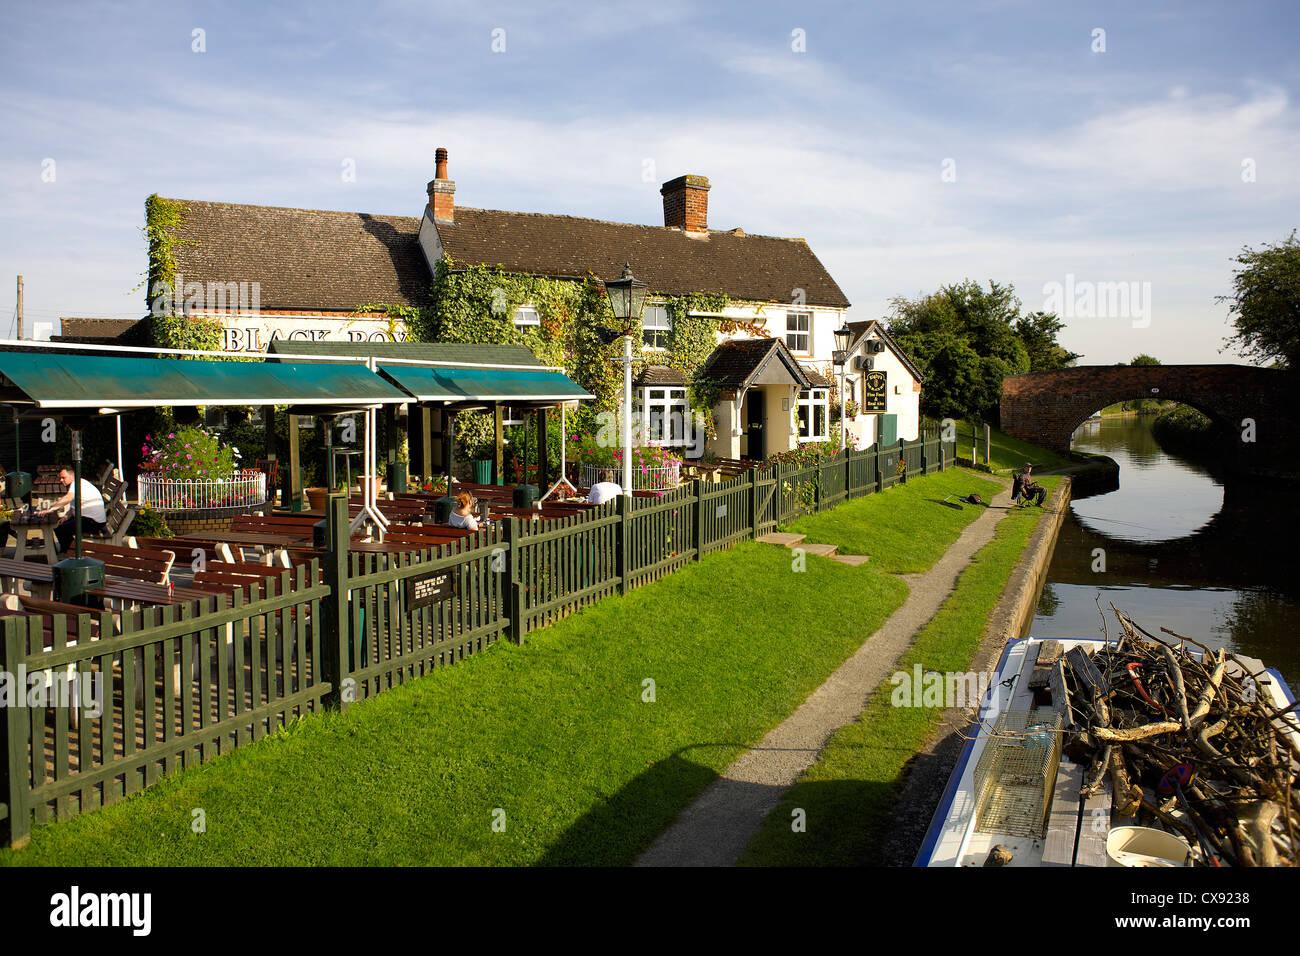 The Black Boy pub, Knowle, near Solihull, Warwickshire, England, UK, Britain, England, British, English, country, - Stock Image